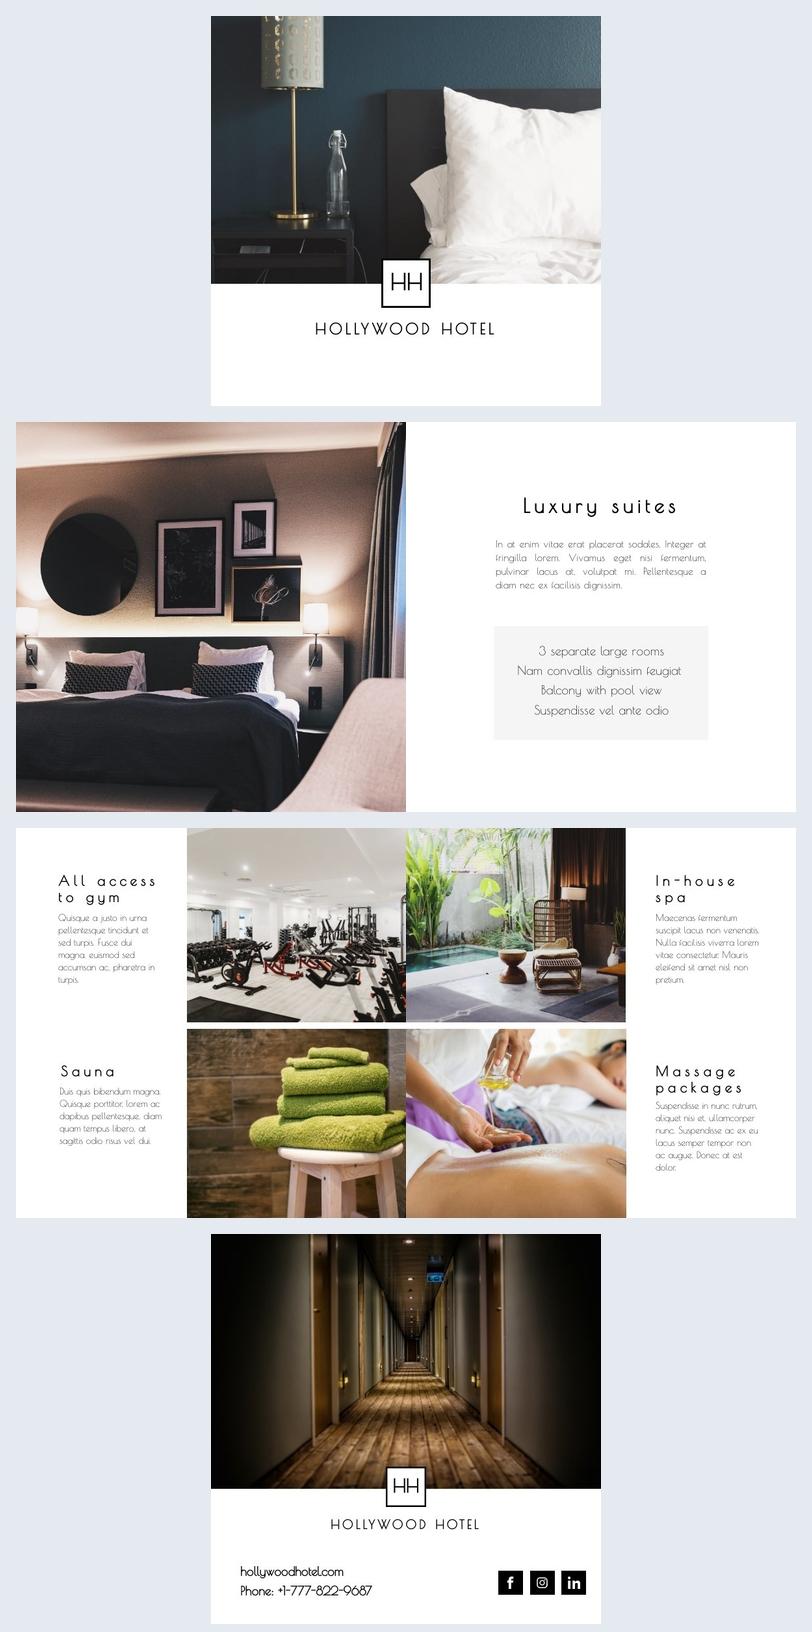 Plantilla genial para folleto de información hotelera